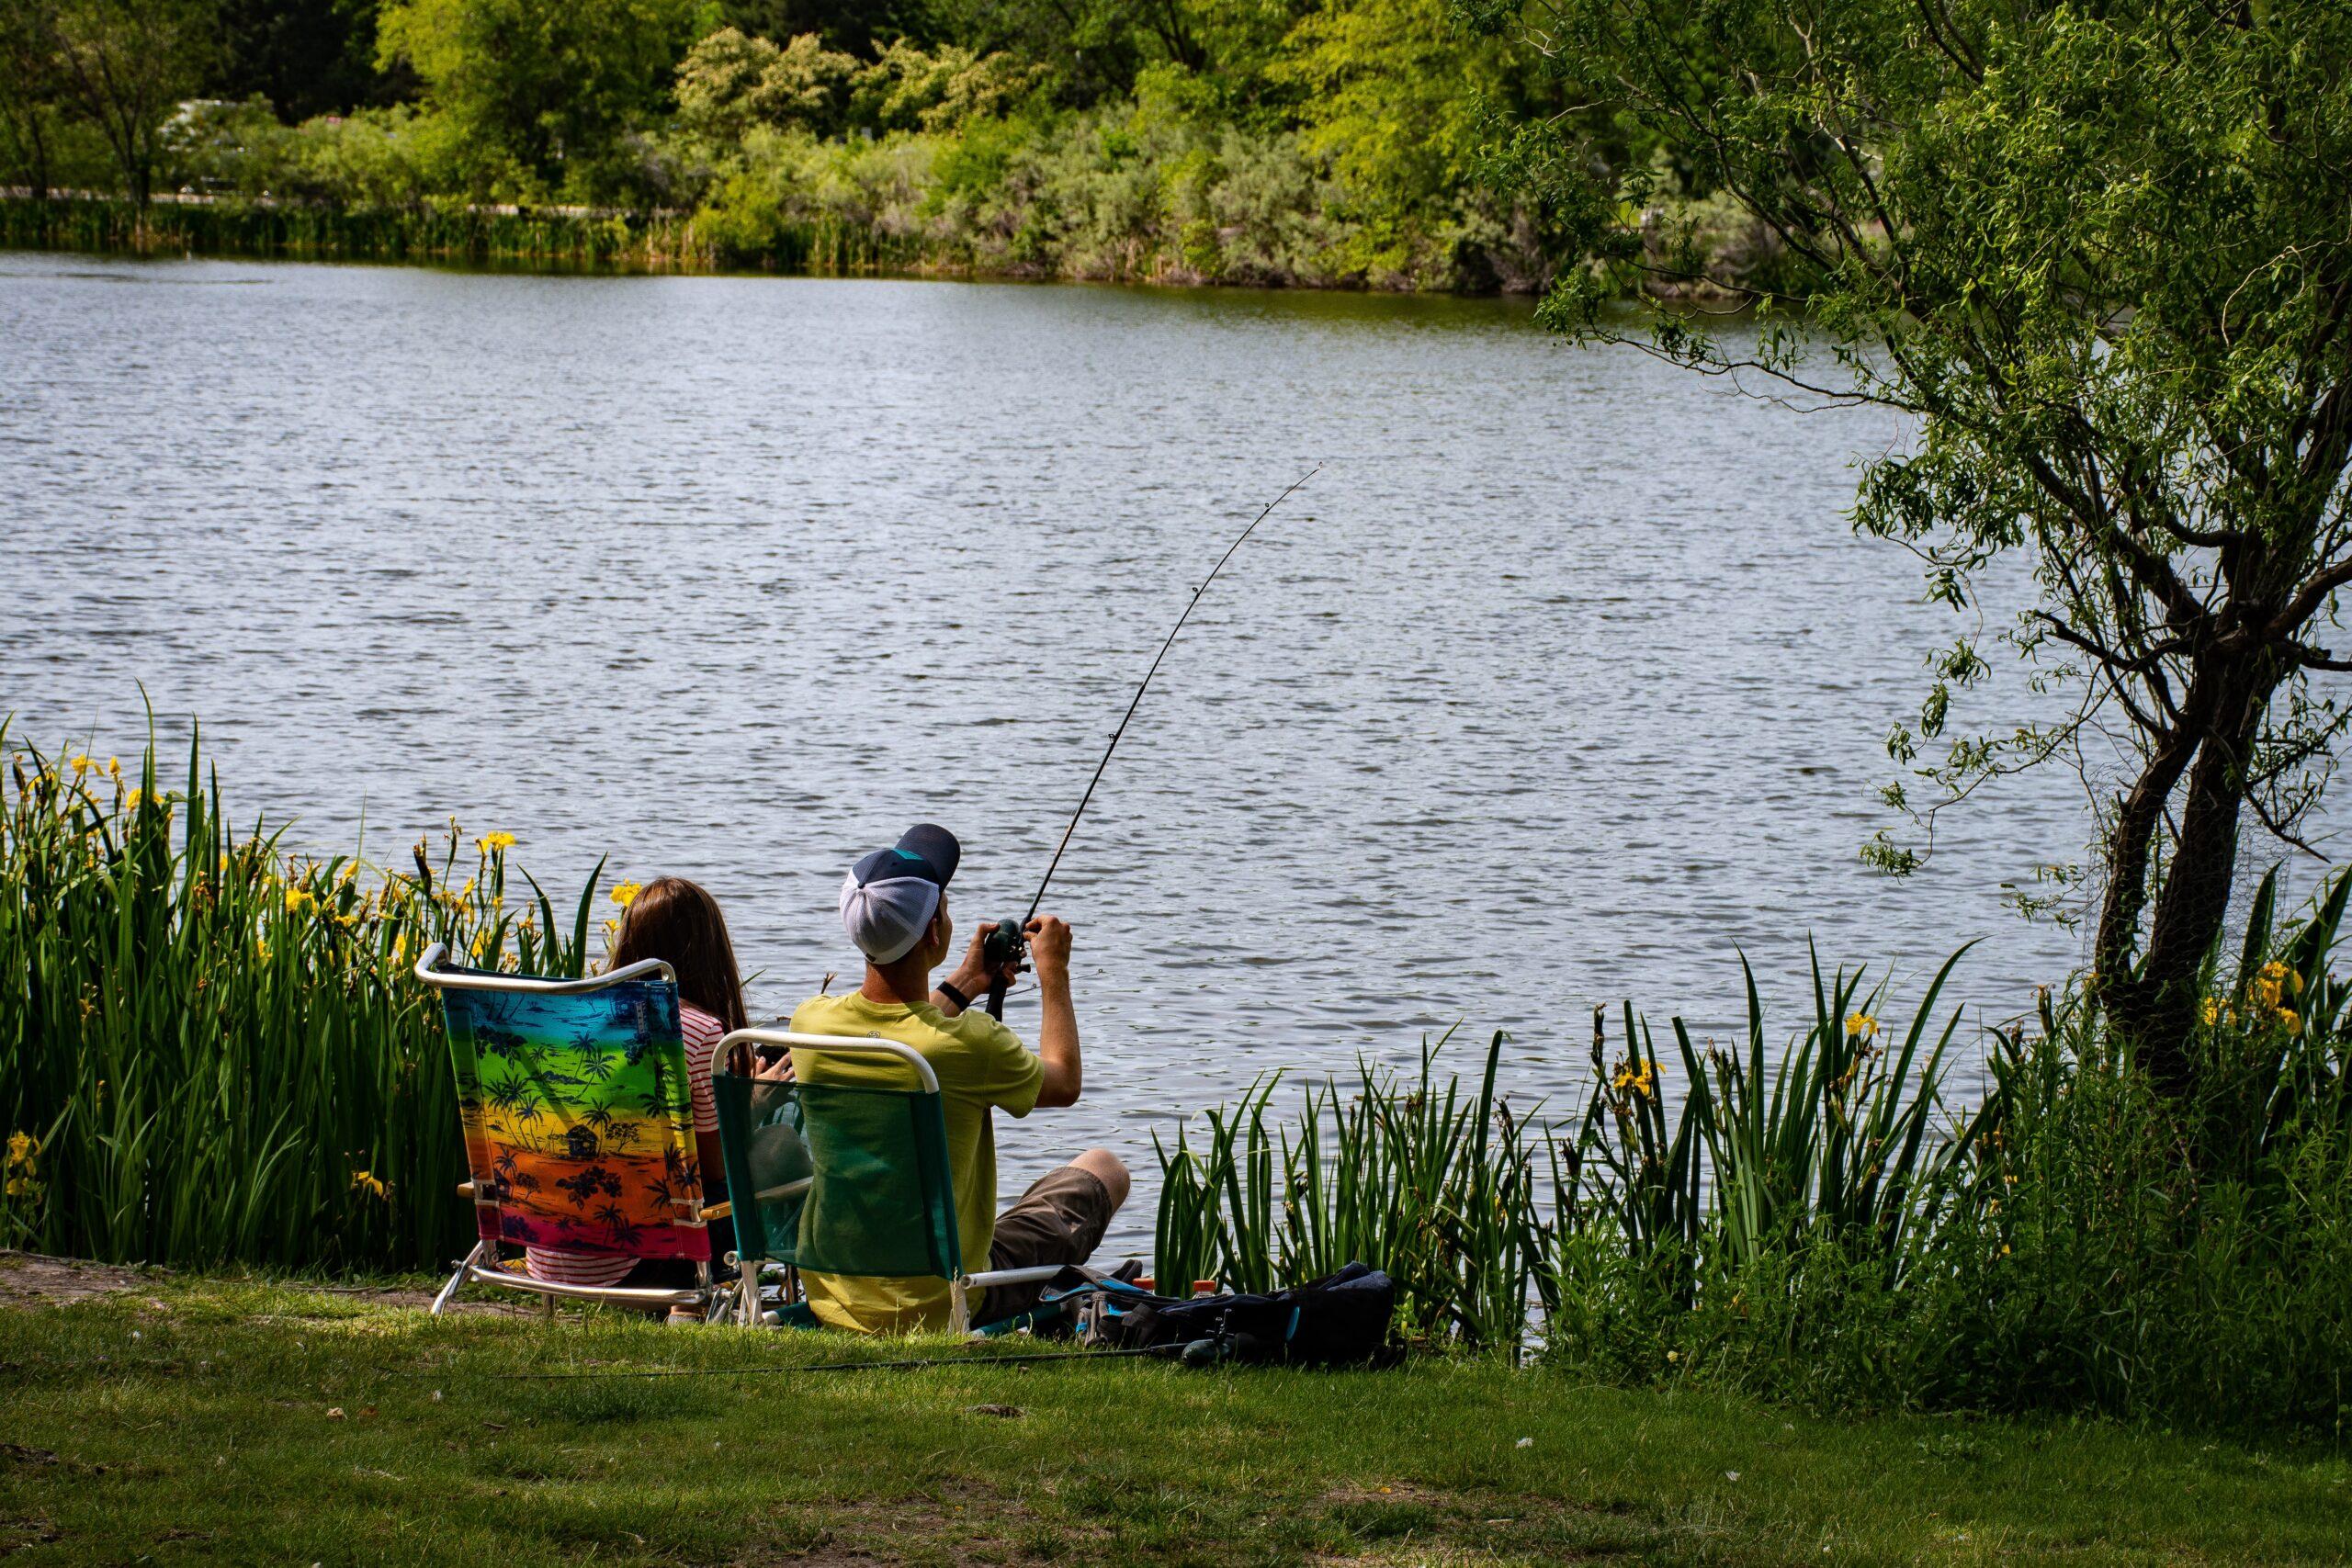 Fishing in Milton Keynes Top Image